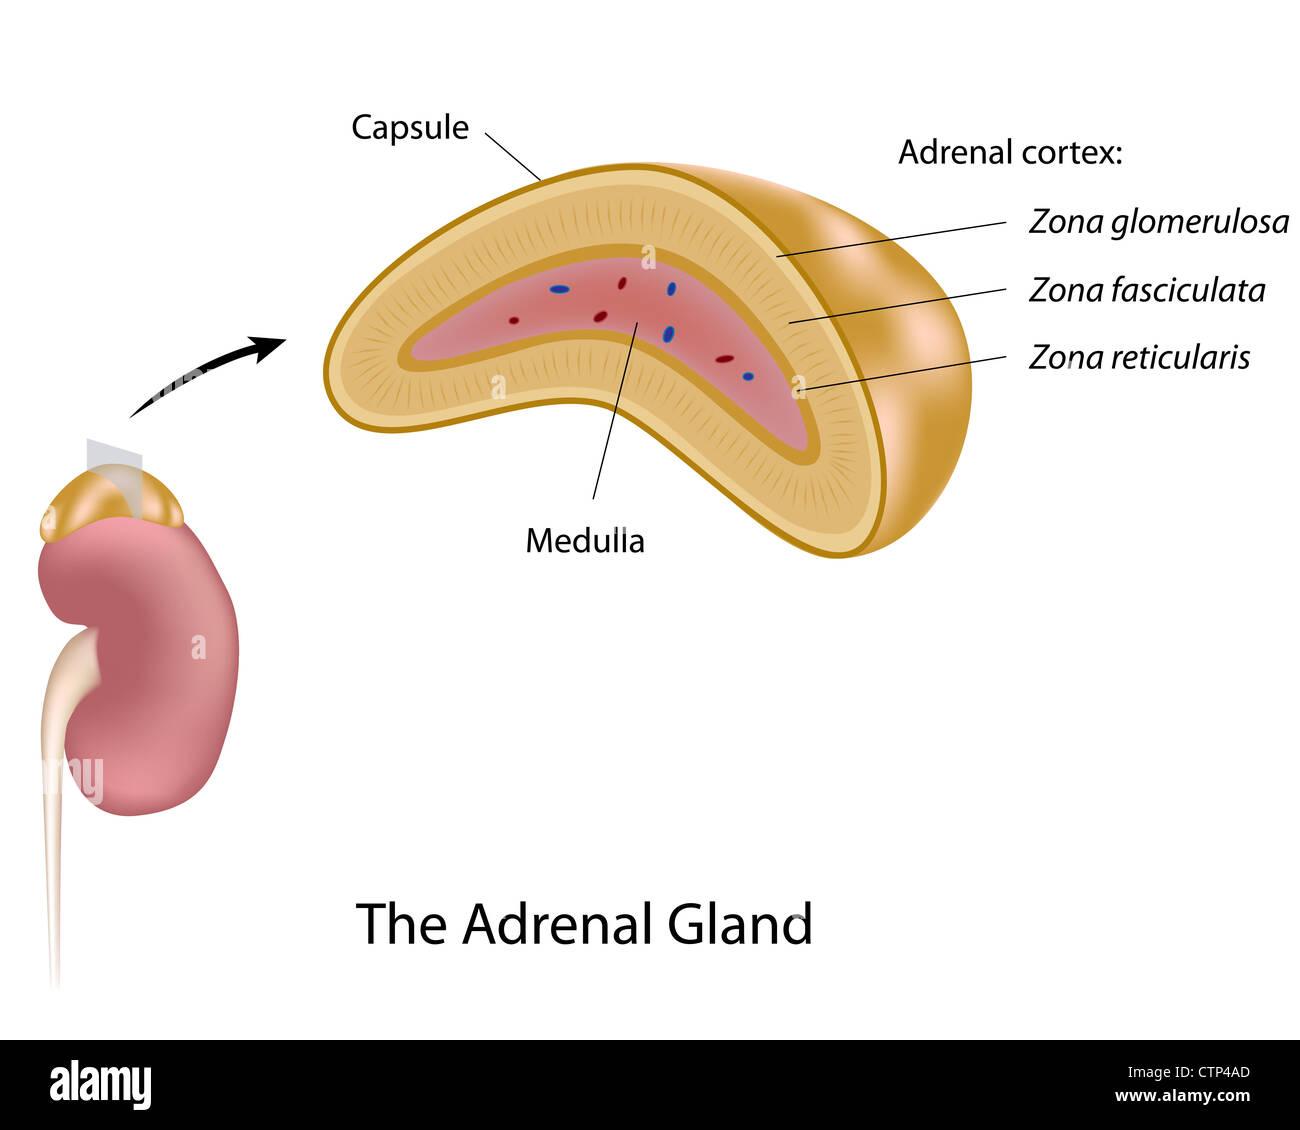 The Adrenal Gland Stock Photo 49658853 Alamy